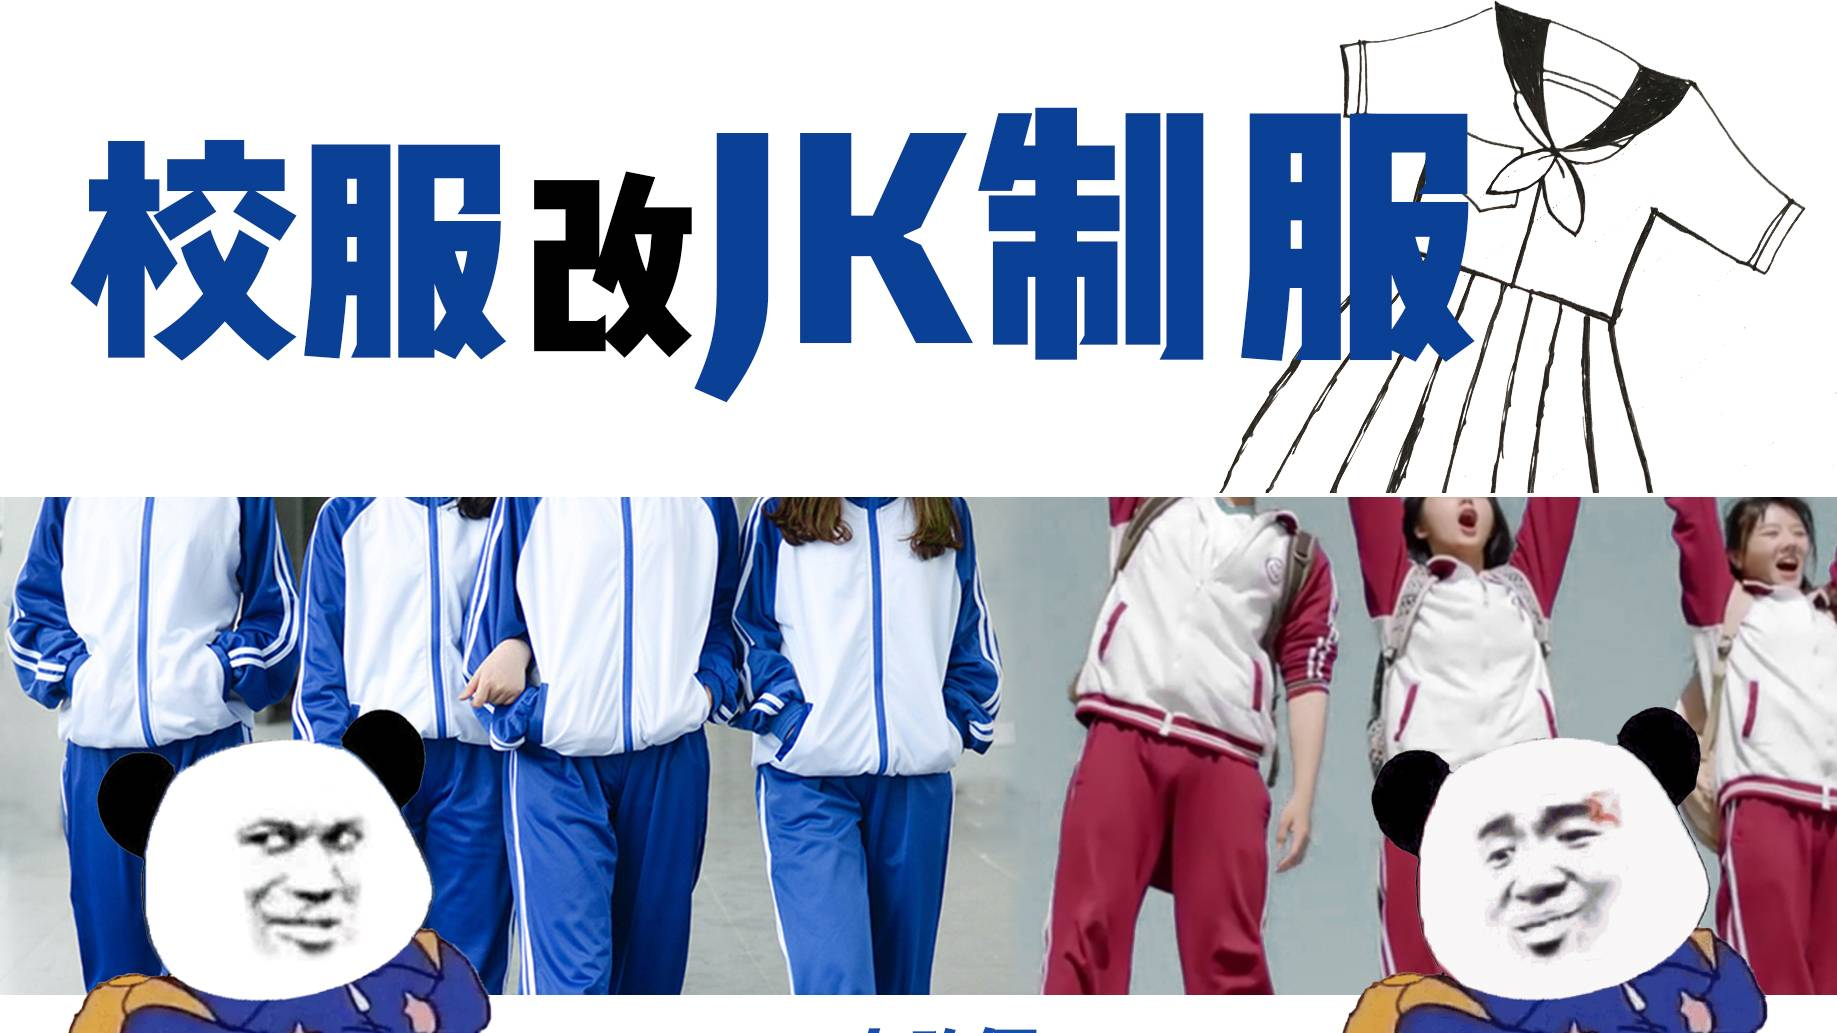 【JK】试图把校服改造成JK制服,校长:???